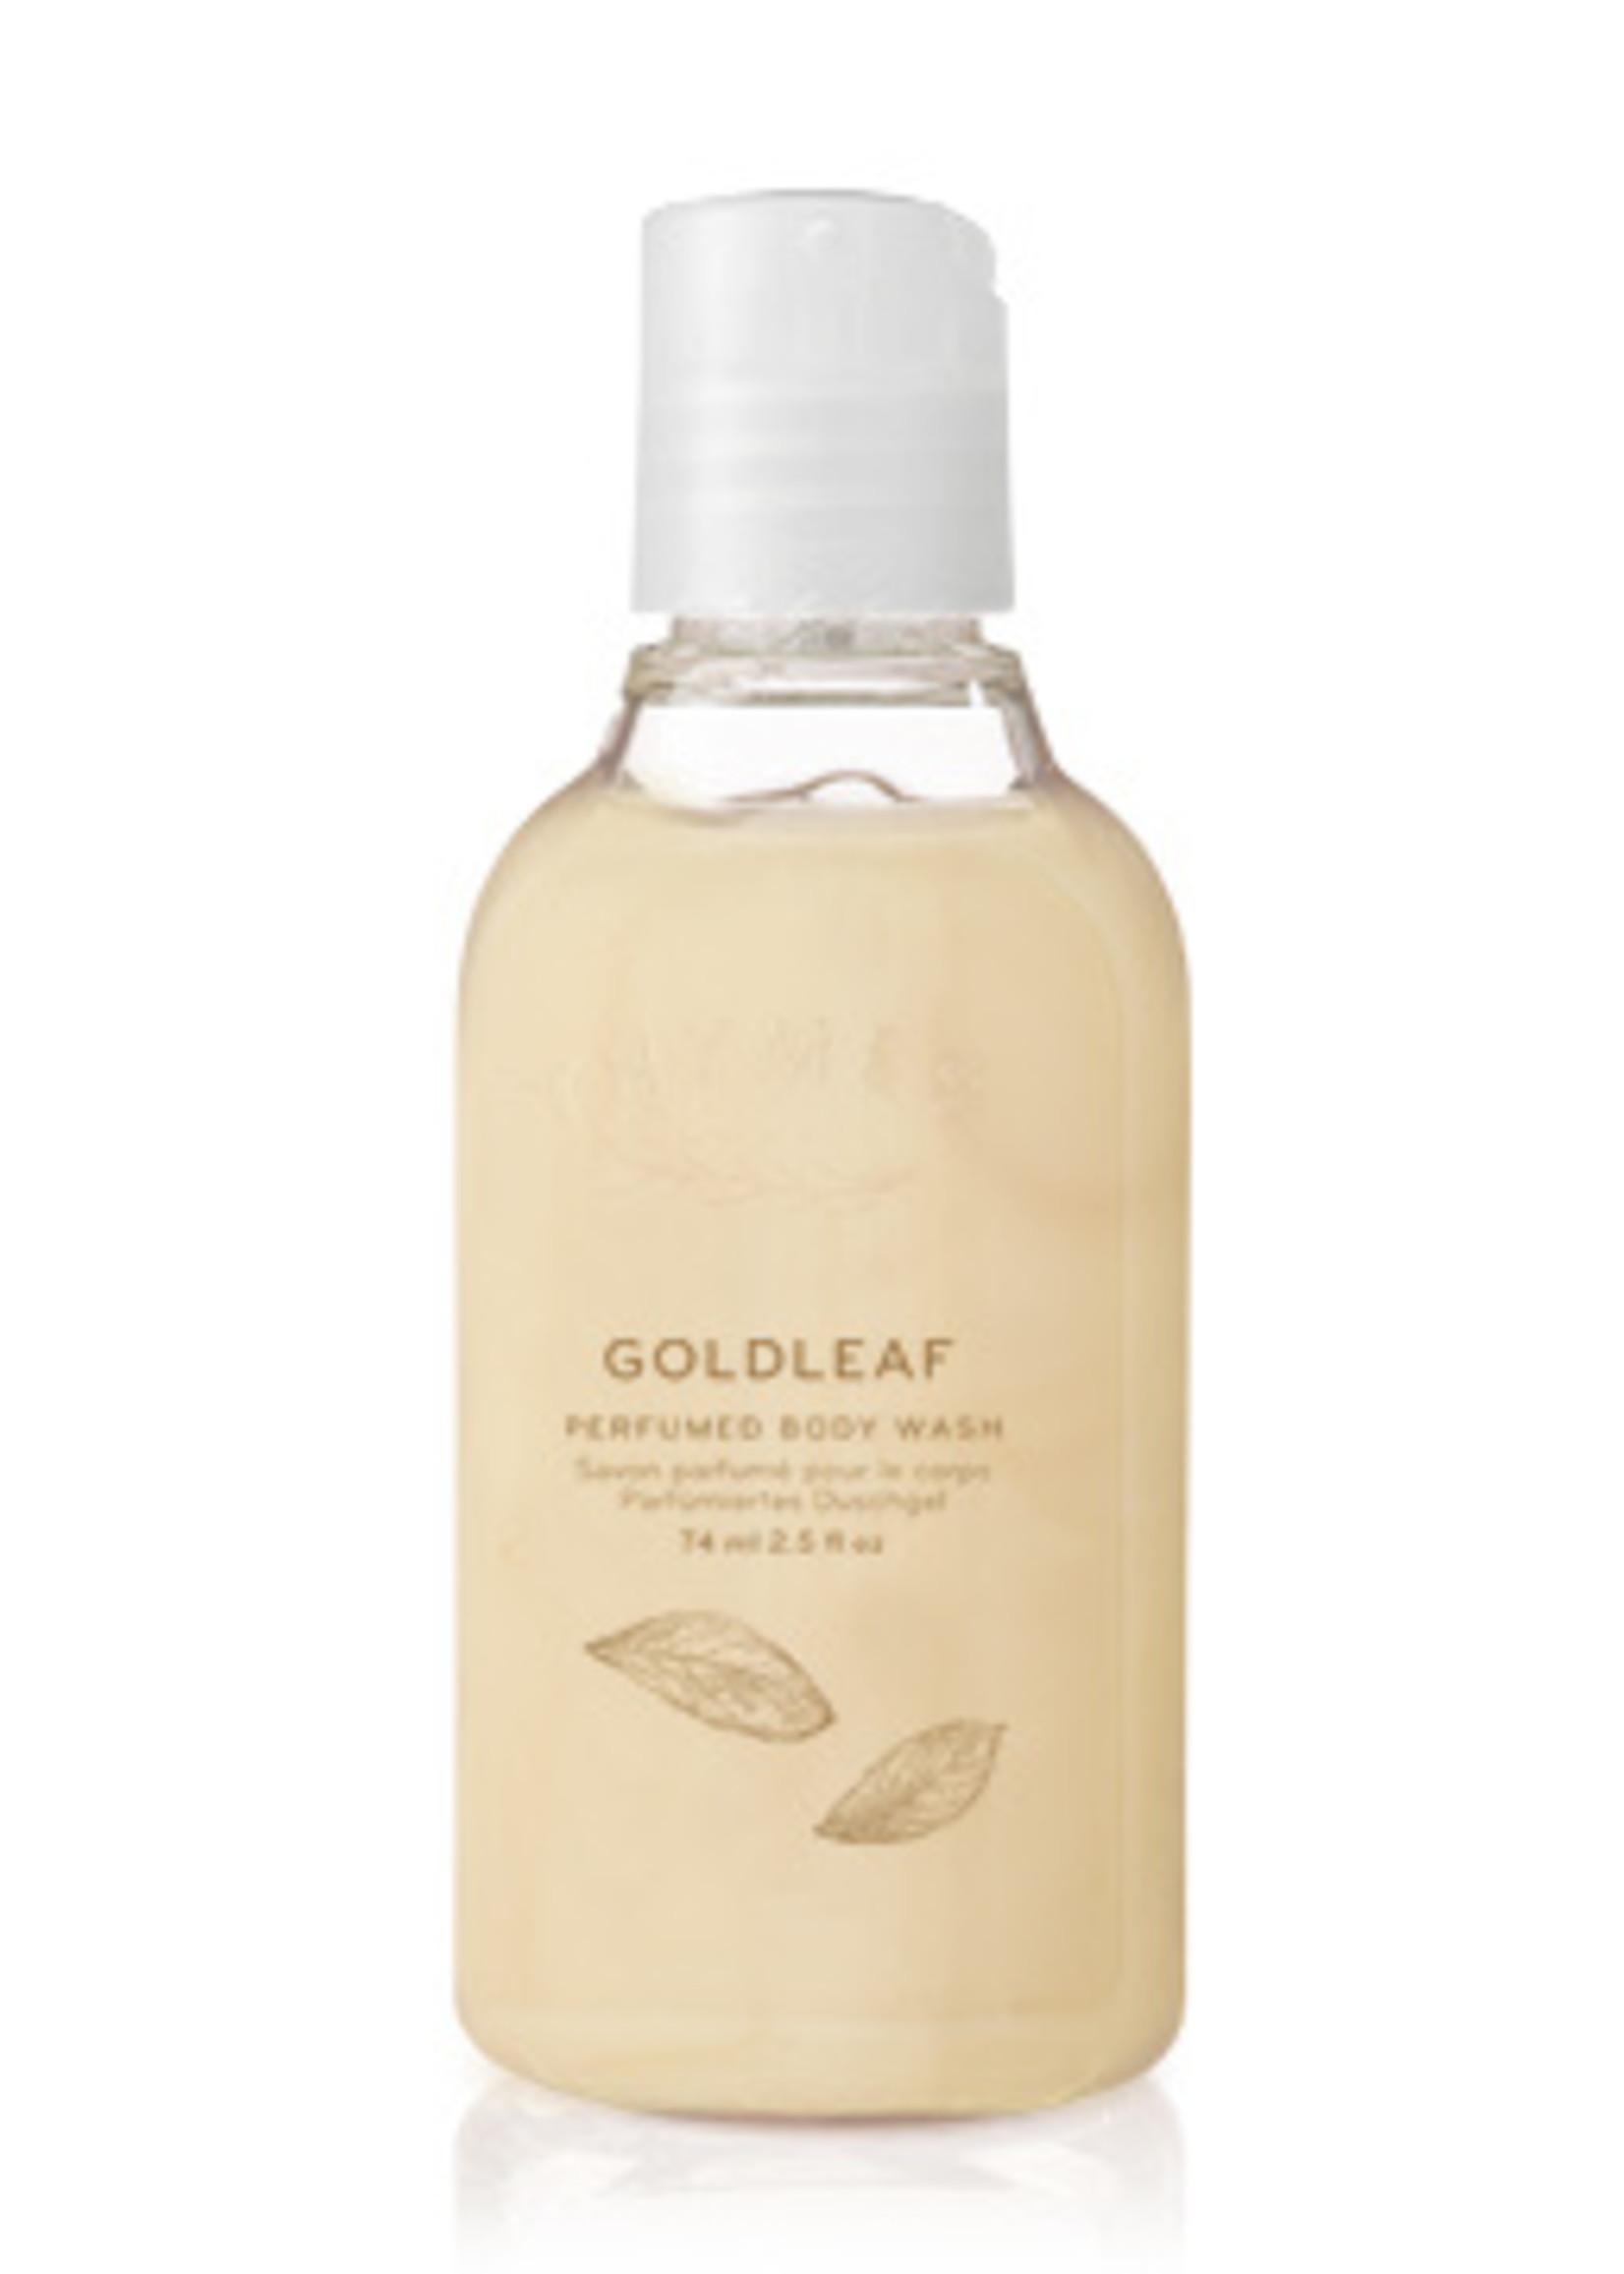 Thymes Goldleaf Petite Body Wash